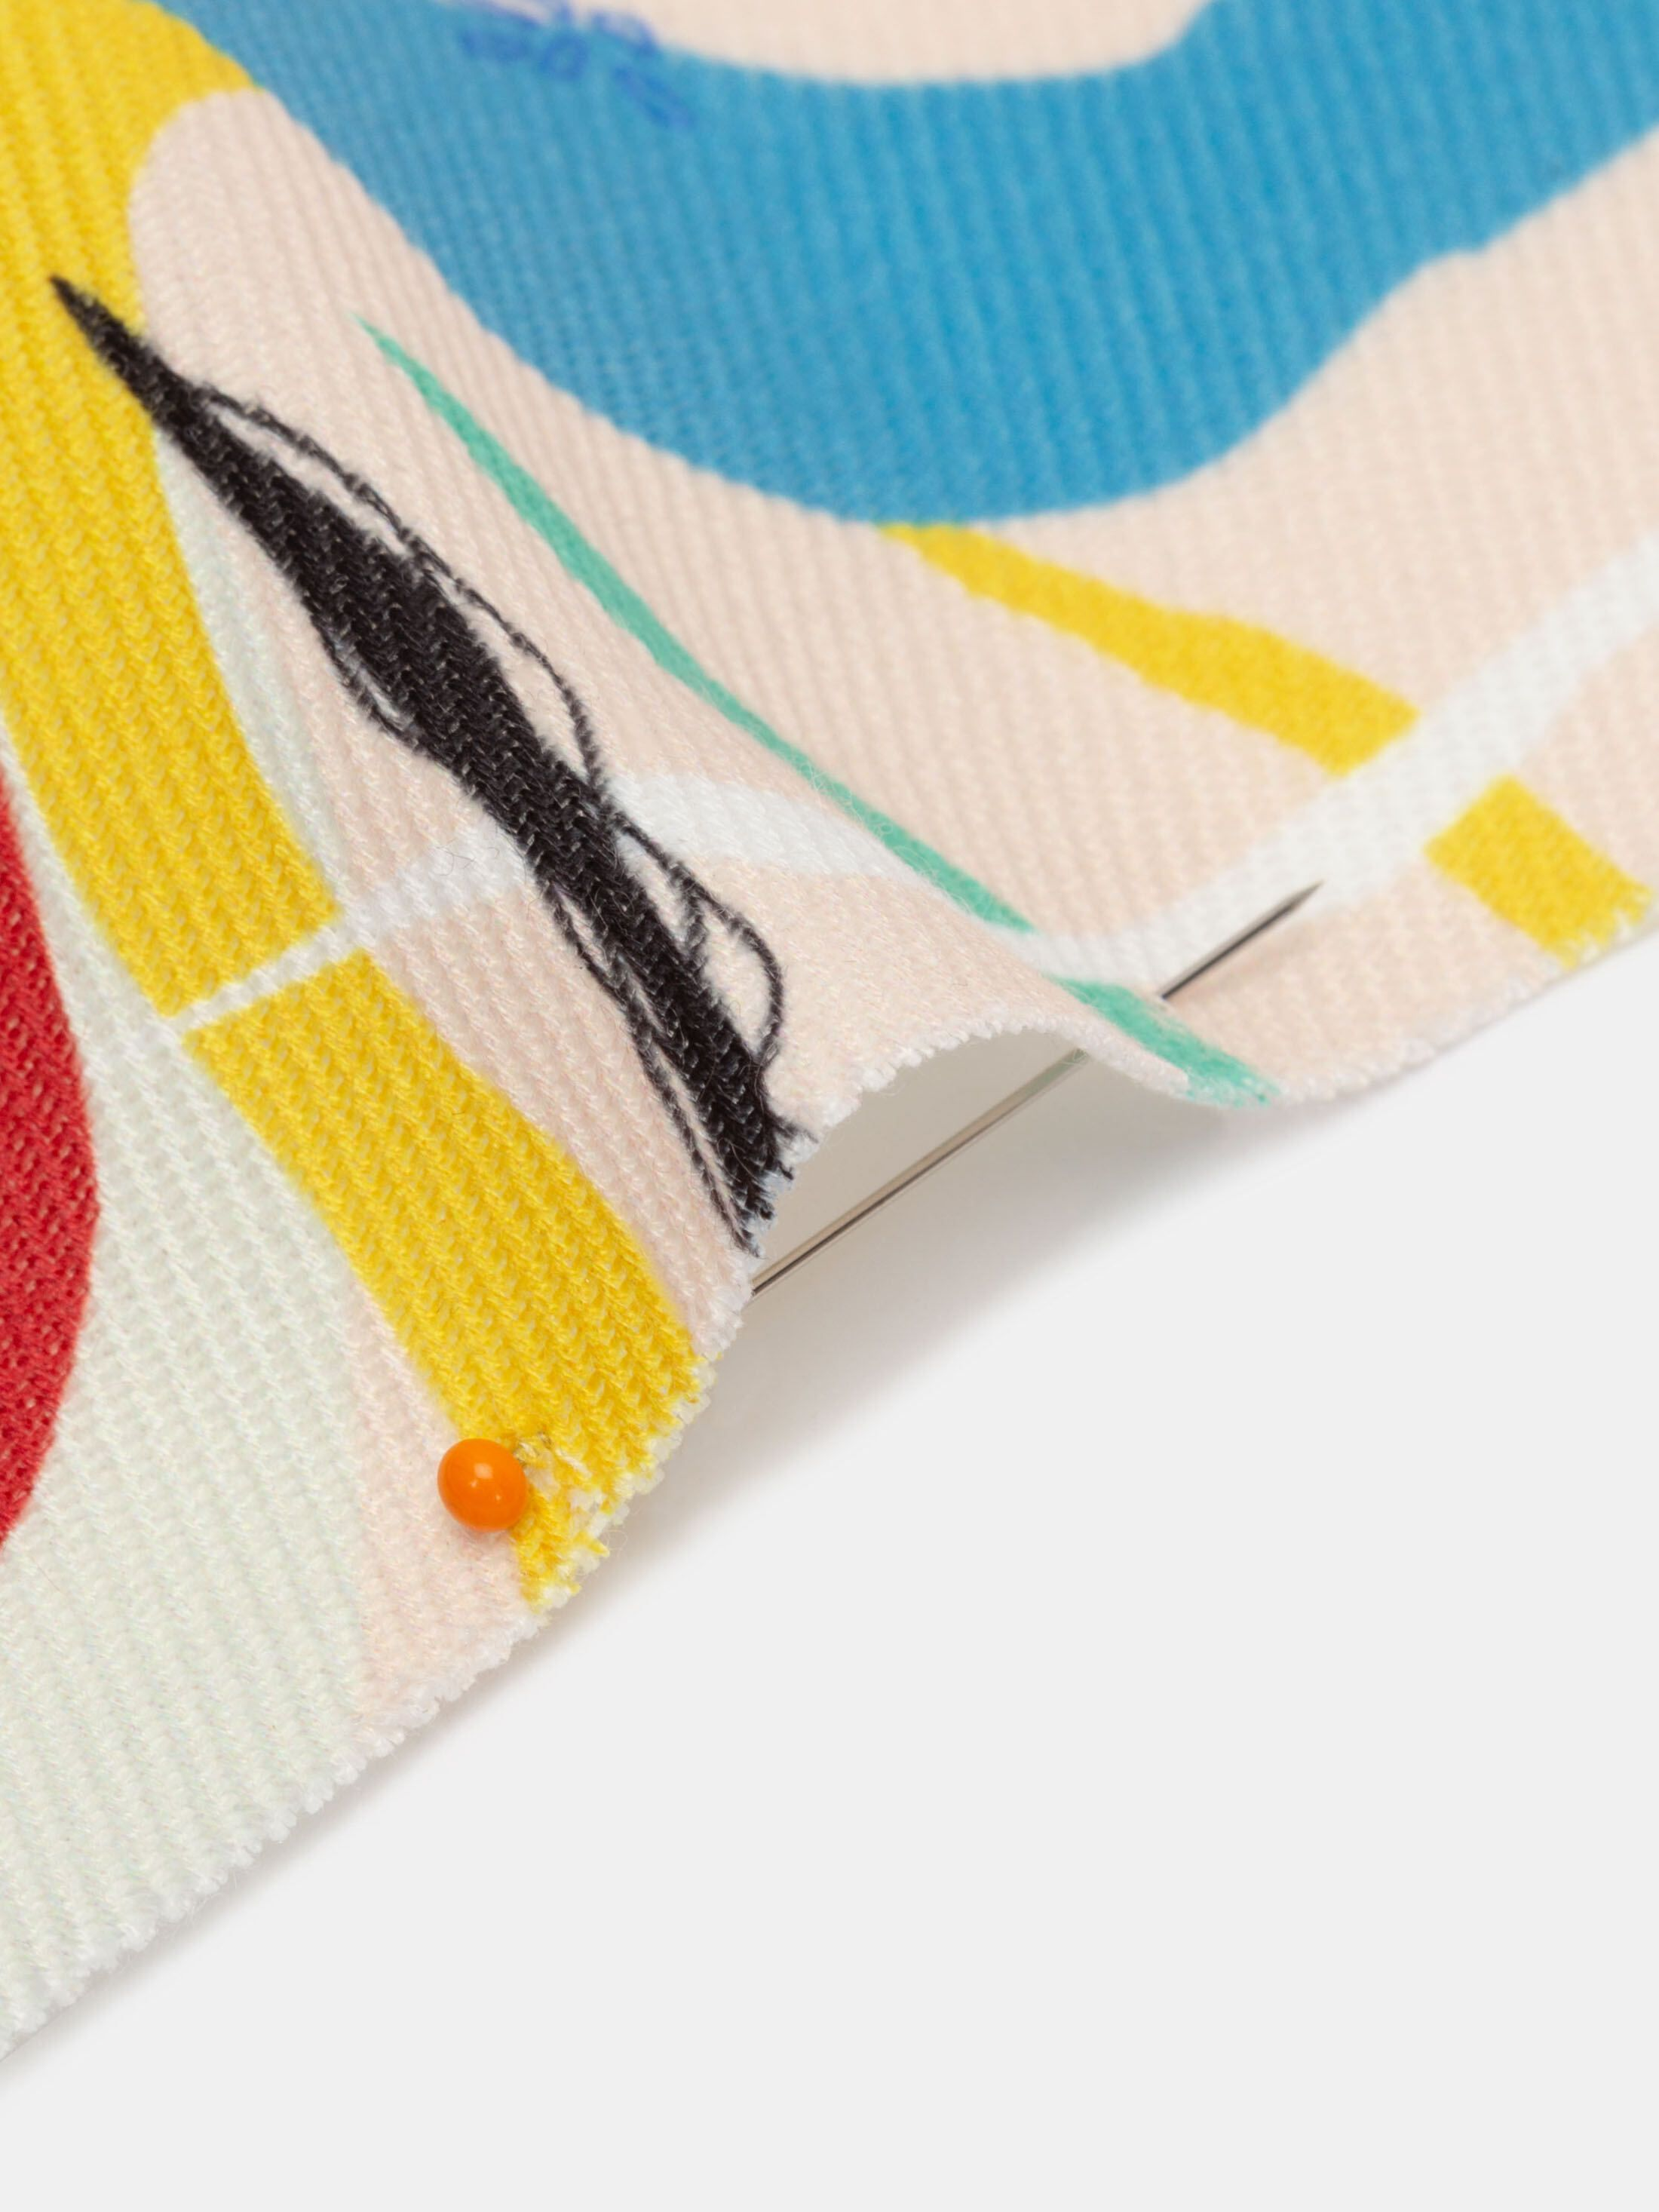 Trafalgar constructed weave Fabric Printing